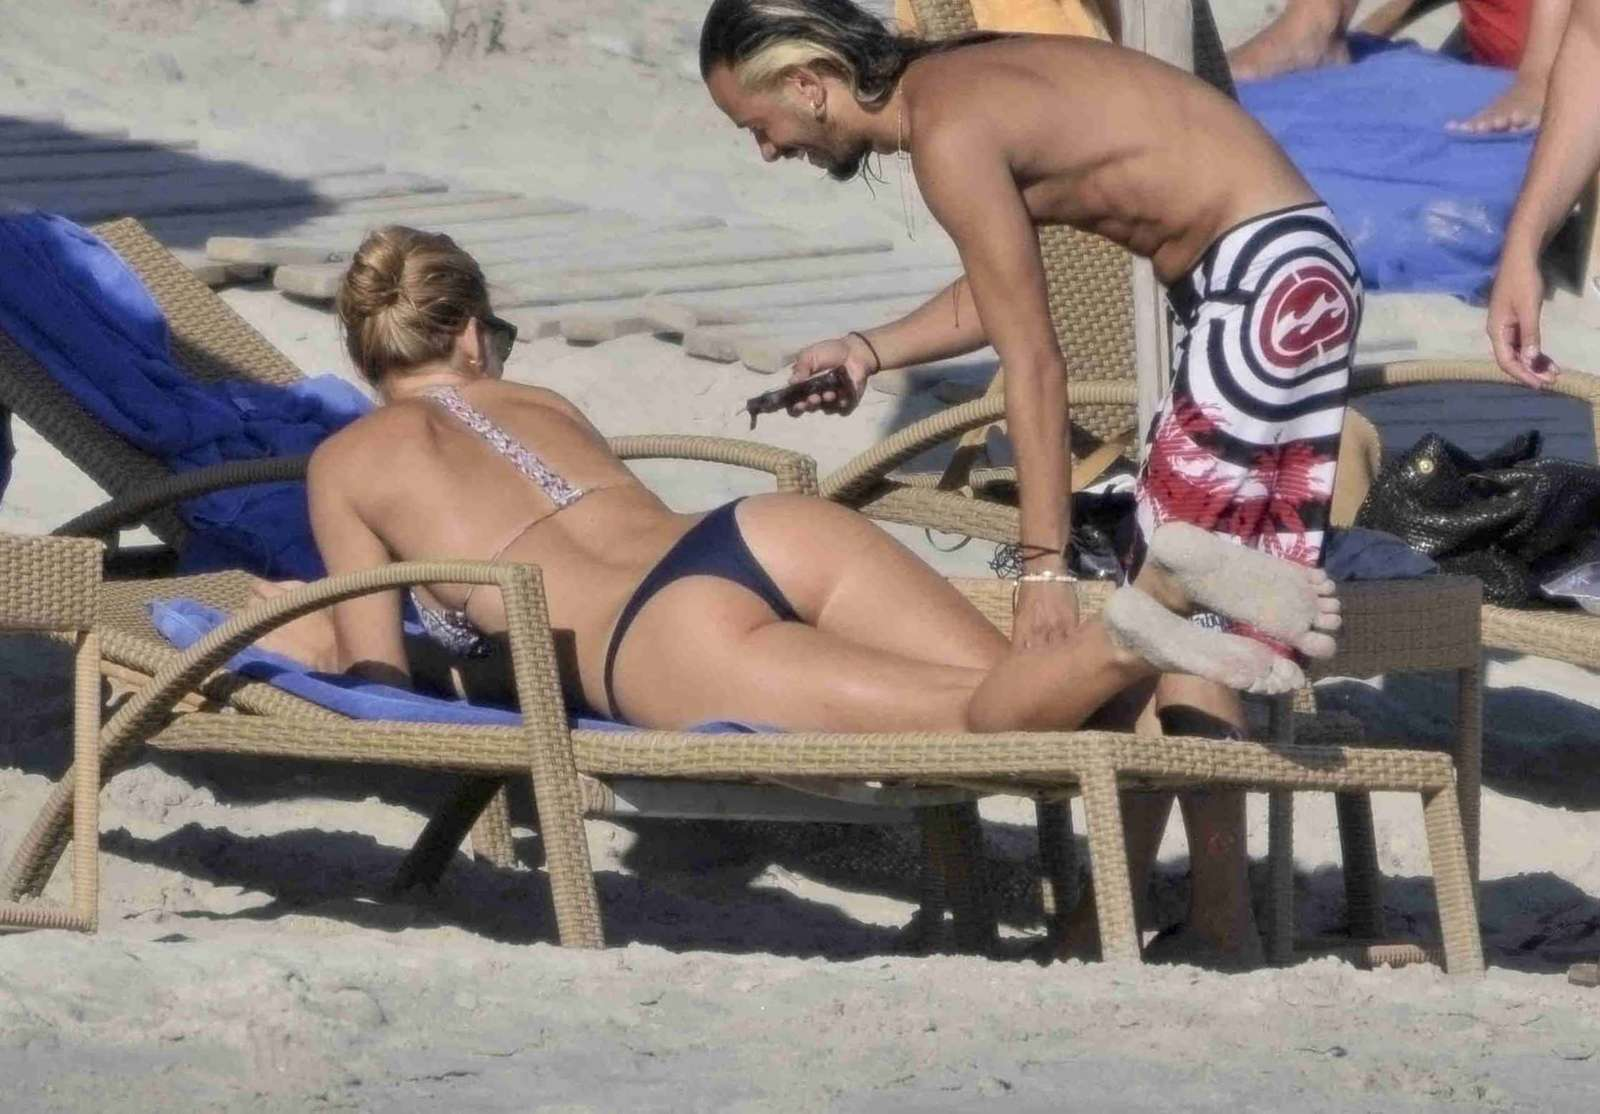 http://3.bp.blogspot.com/-YXFloQtxEdc/UEj6O7kq6DI/AAAAAAAAAPU/UQqUxBf9cnk/s1600/Bar+Refaeli+in+bikini-17.jpg